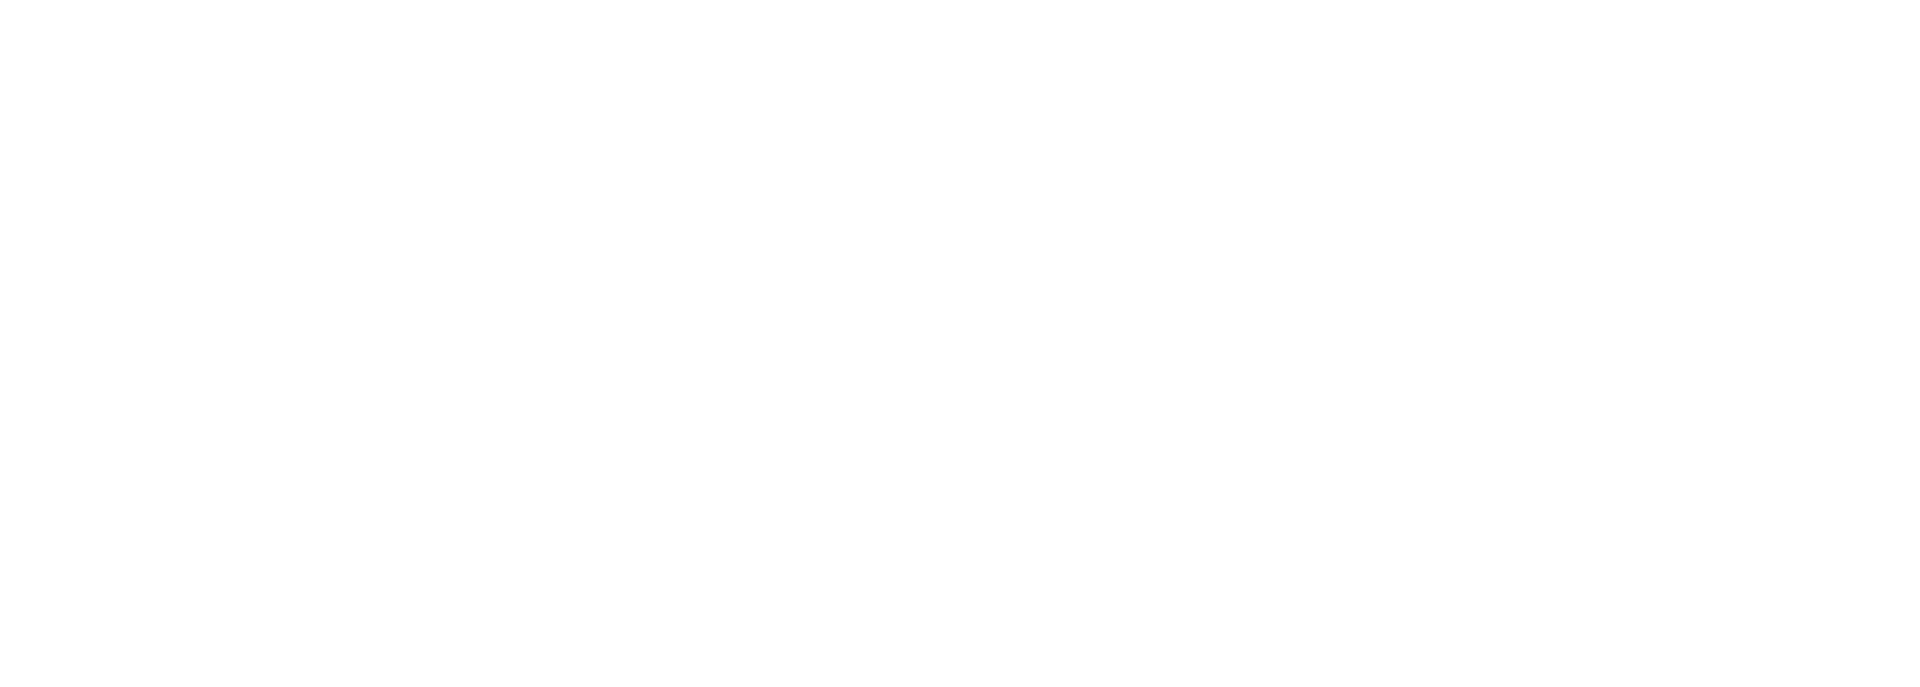 Watch-now-online